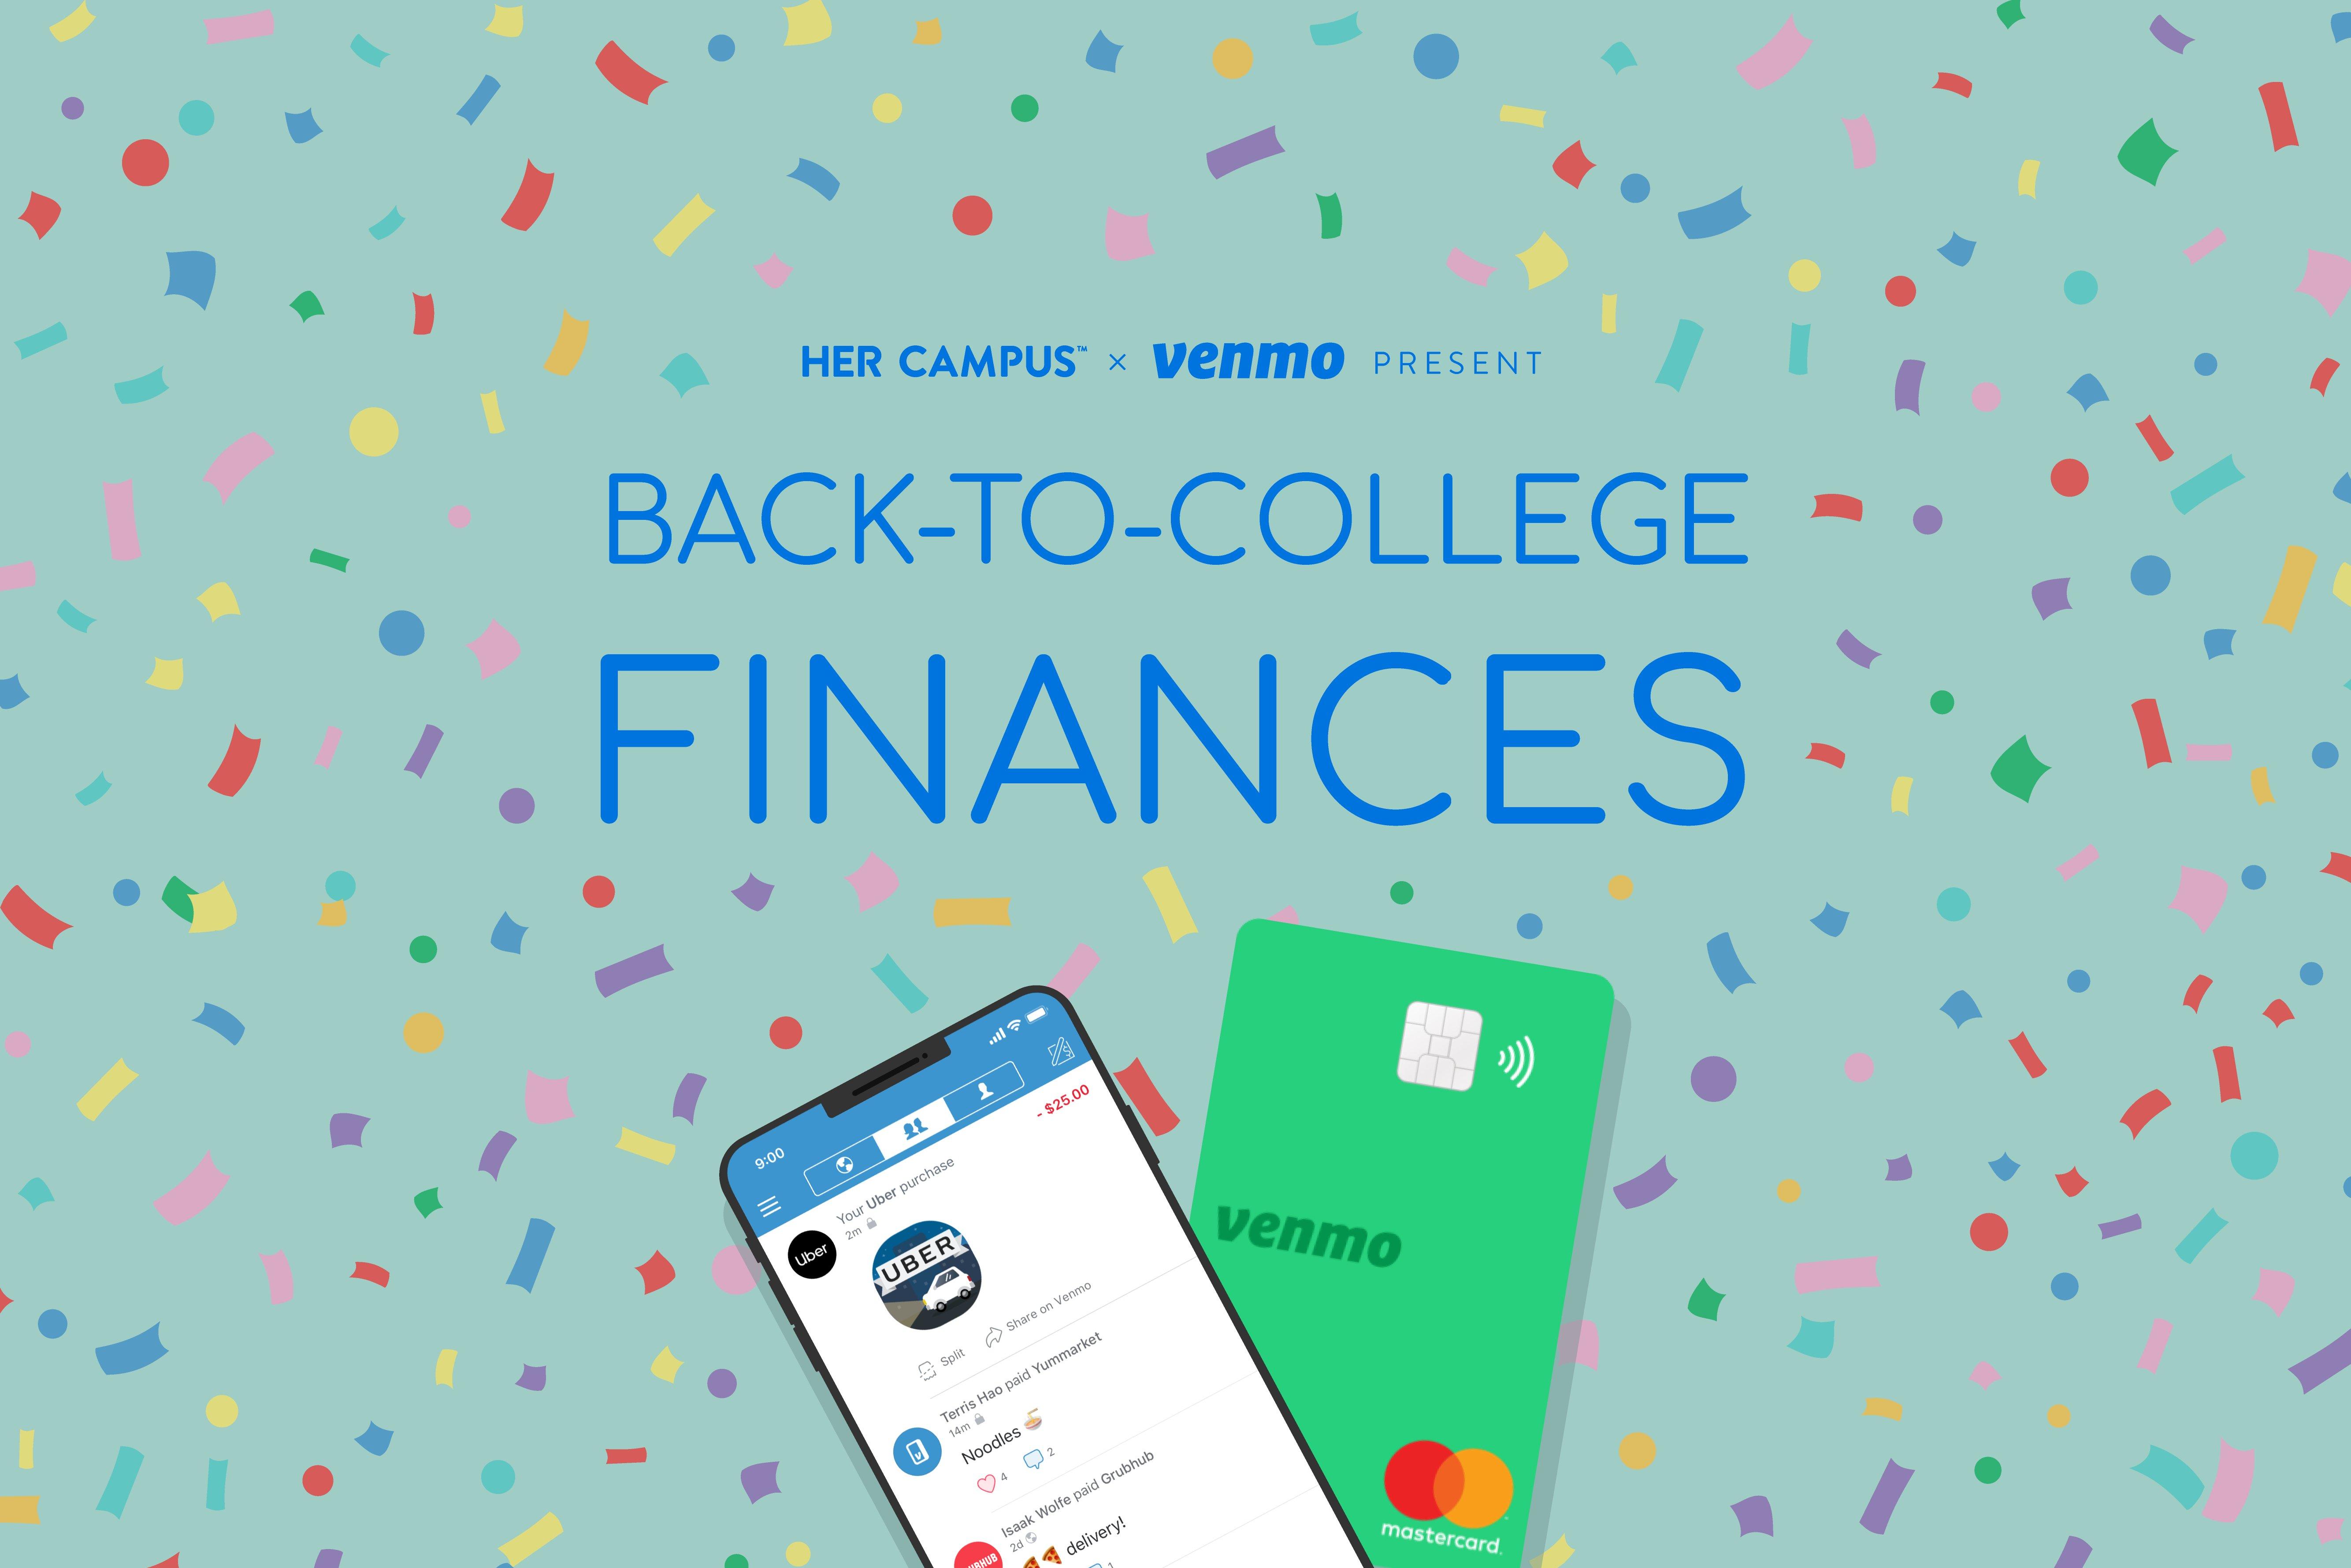 BACK TO SCHOOL FINANCES